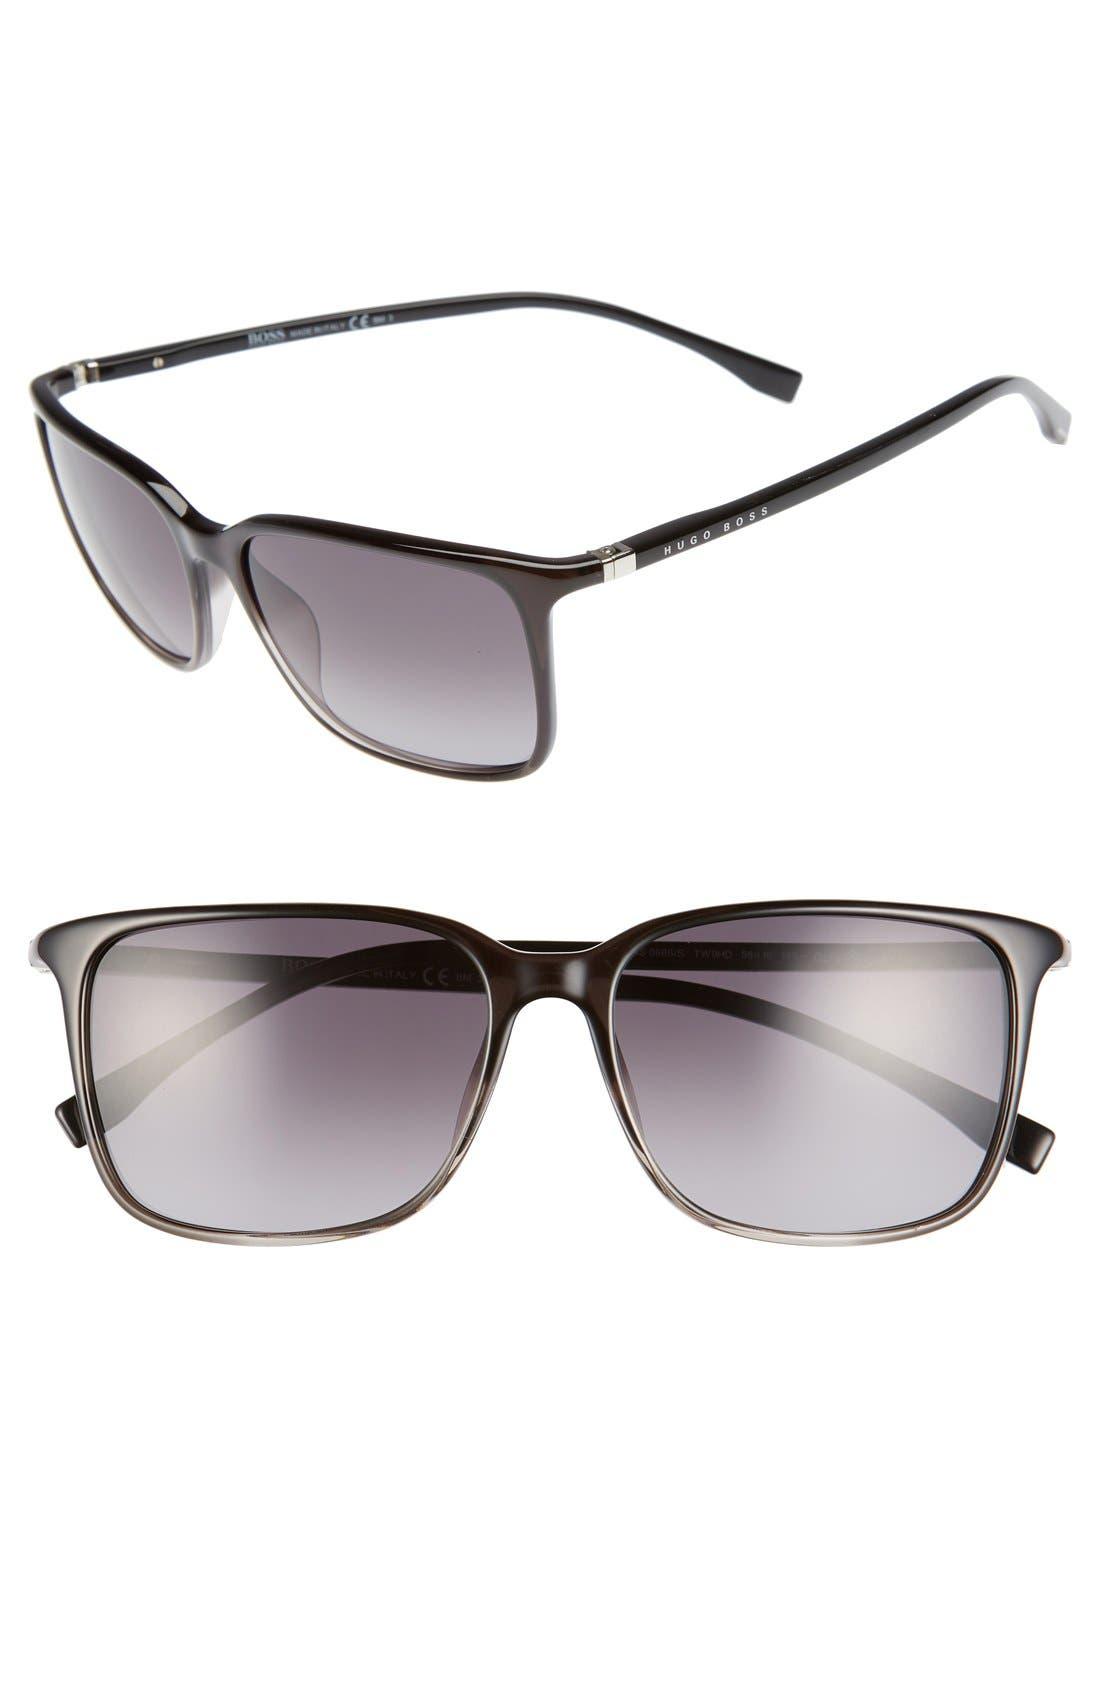 Main Image - BOSS '0666/S' 52mm Sunglasses